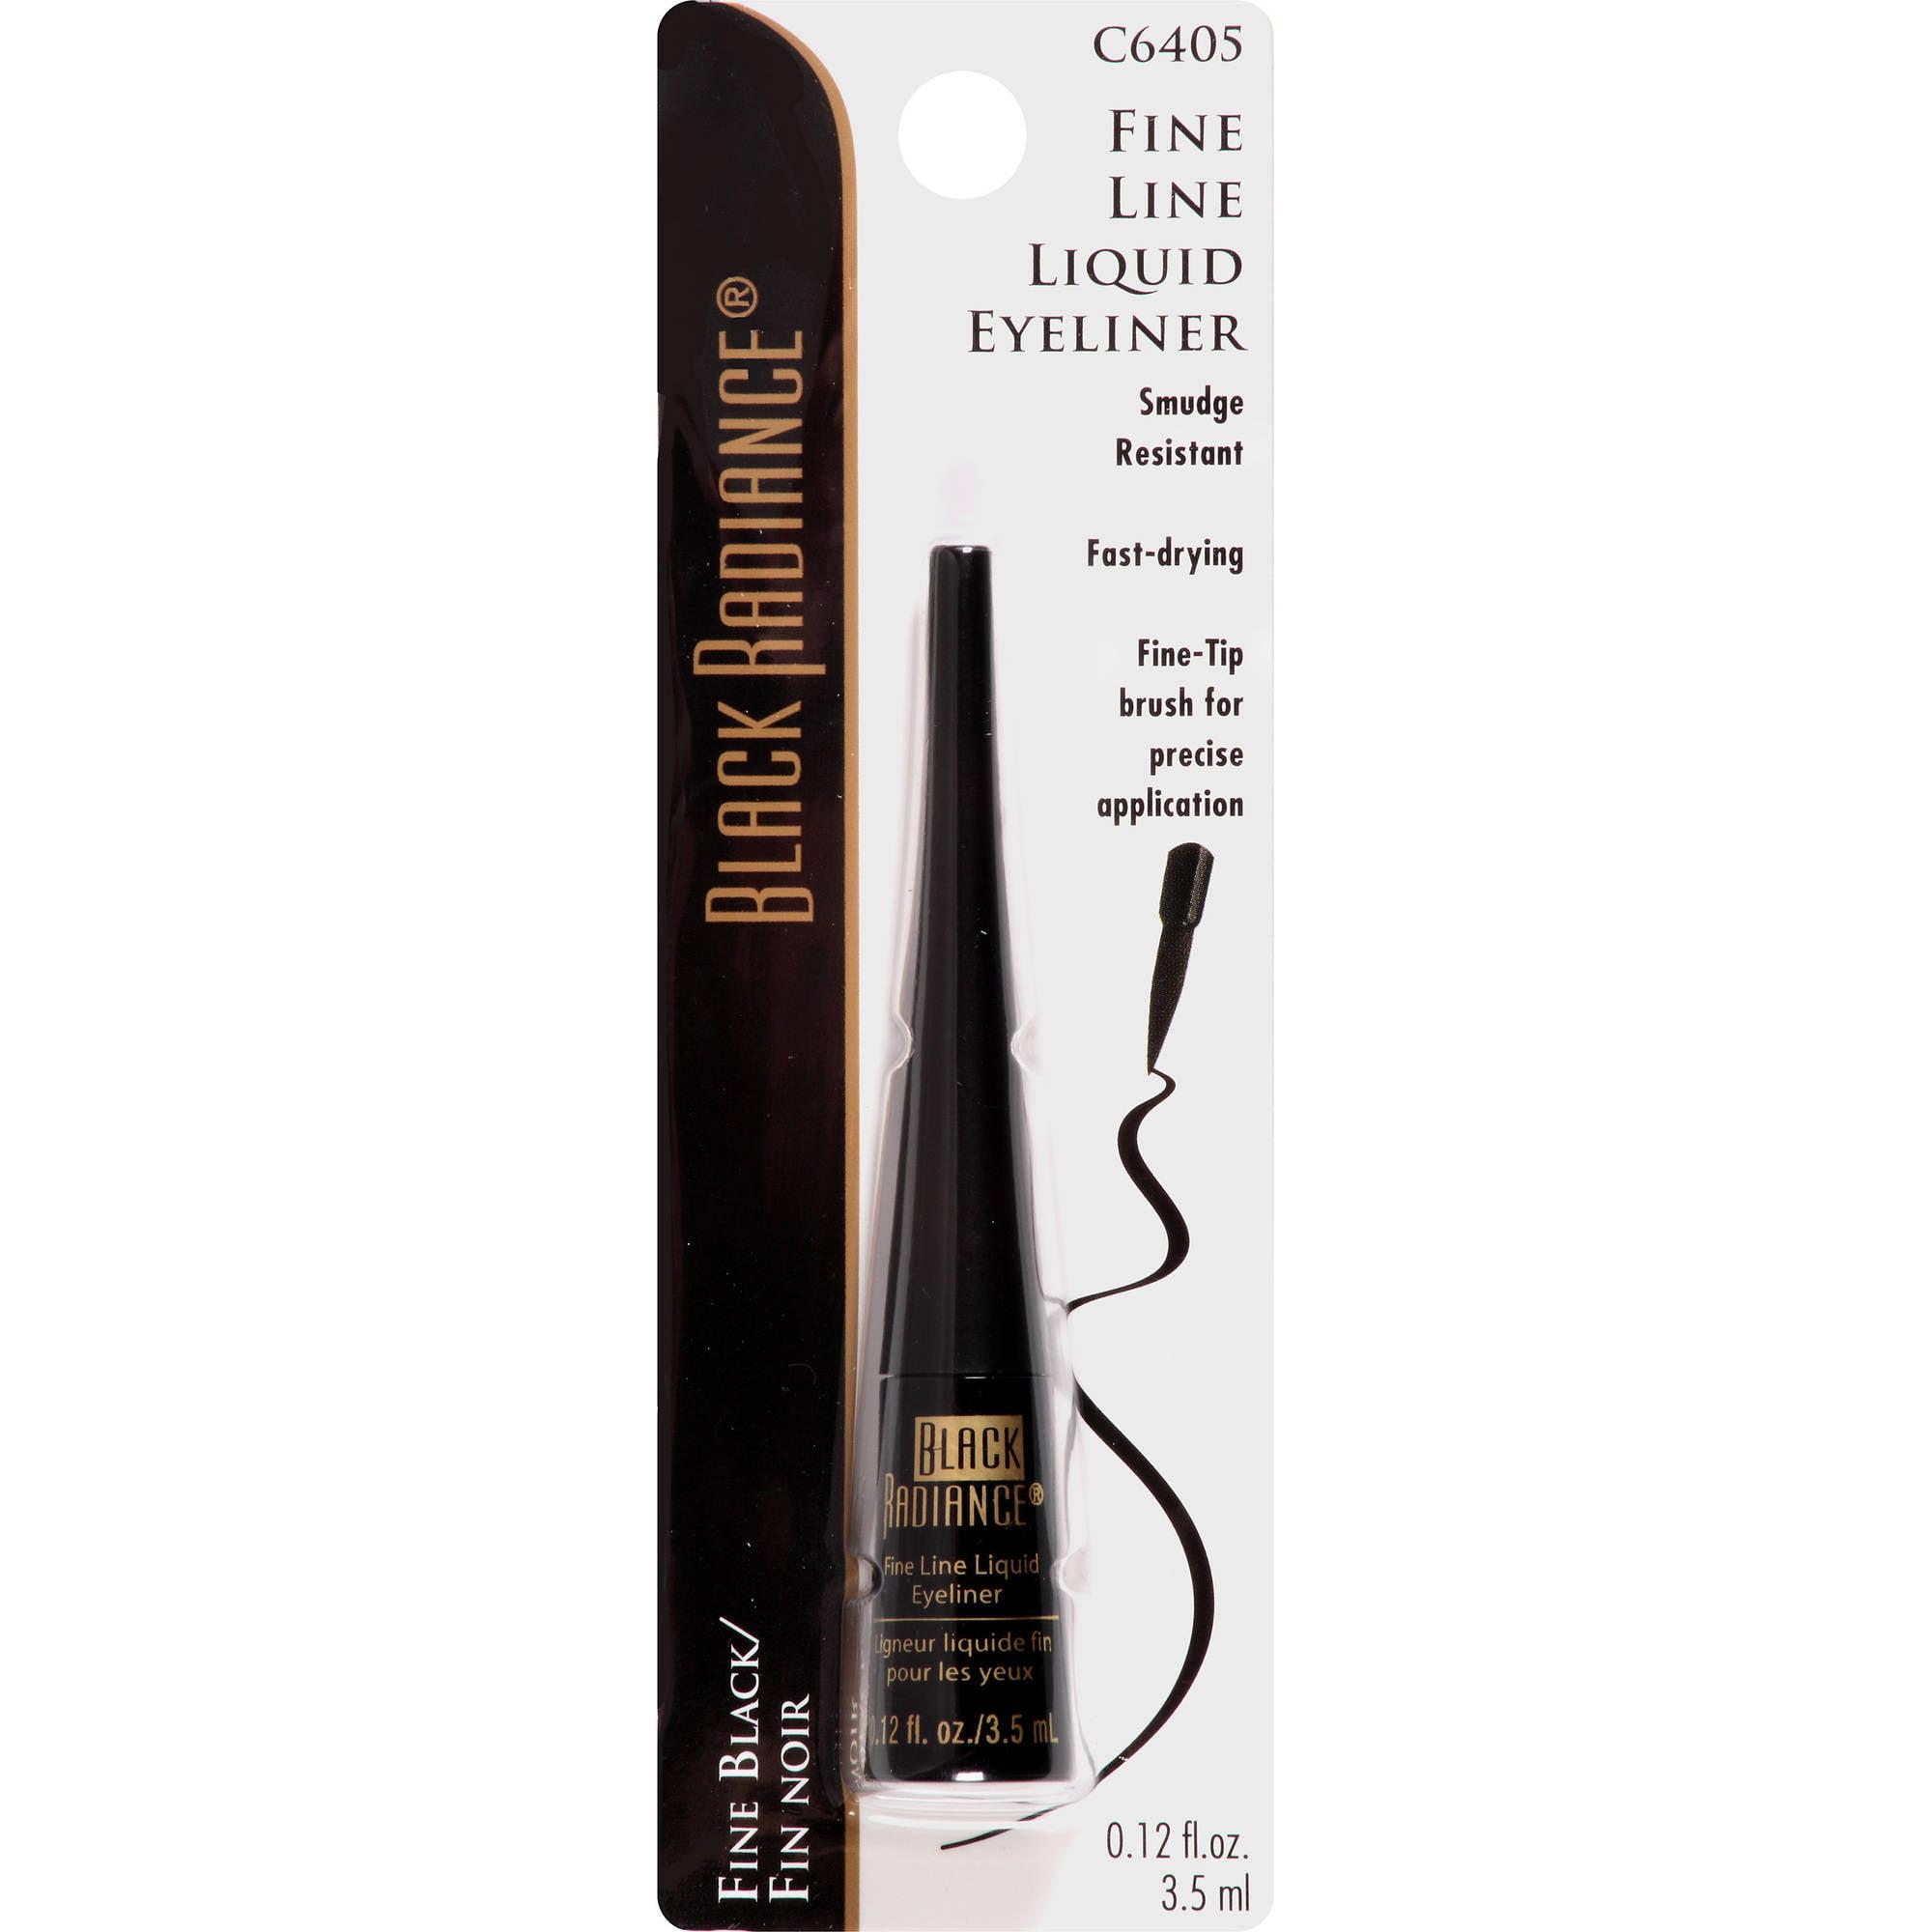 Black Radiance Fine Line Liquid Eyeliner, CA6405 Fine Black, 0.12 fl oz